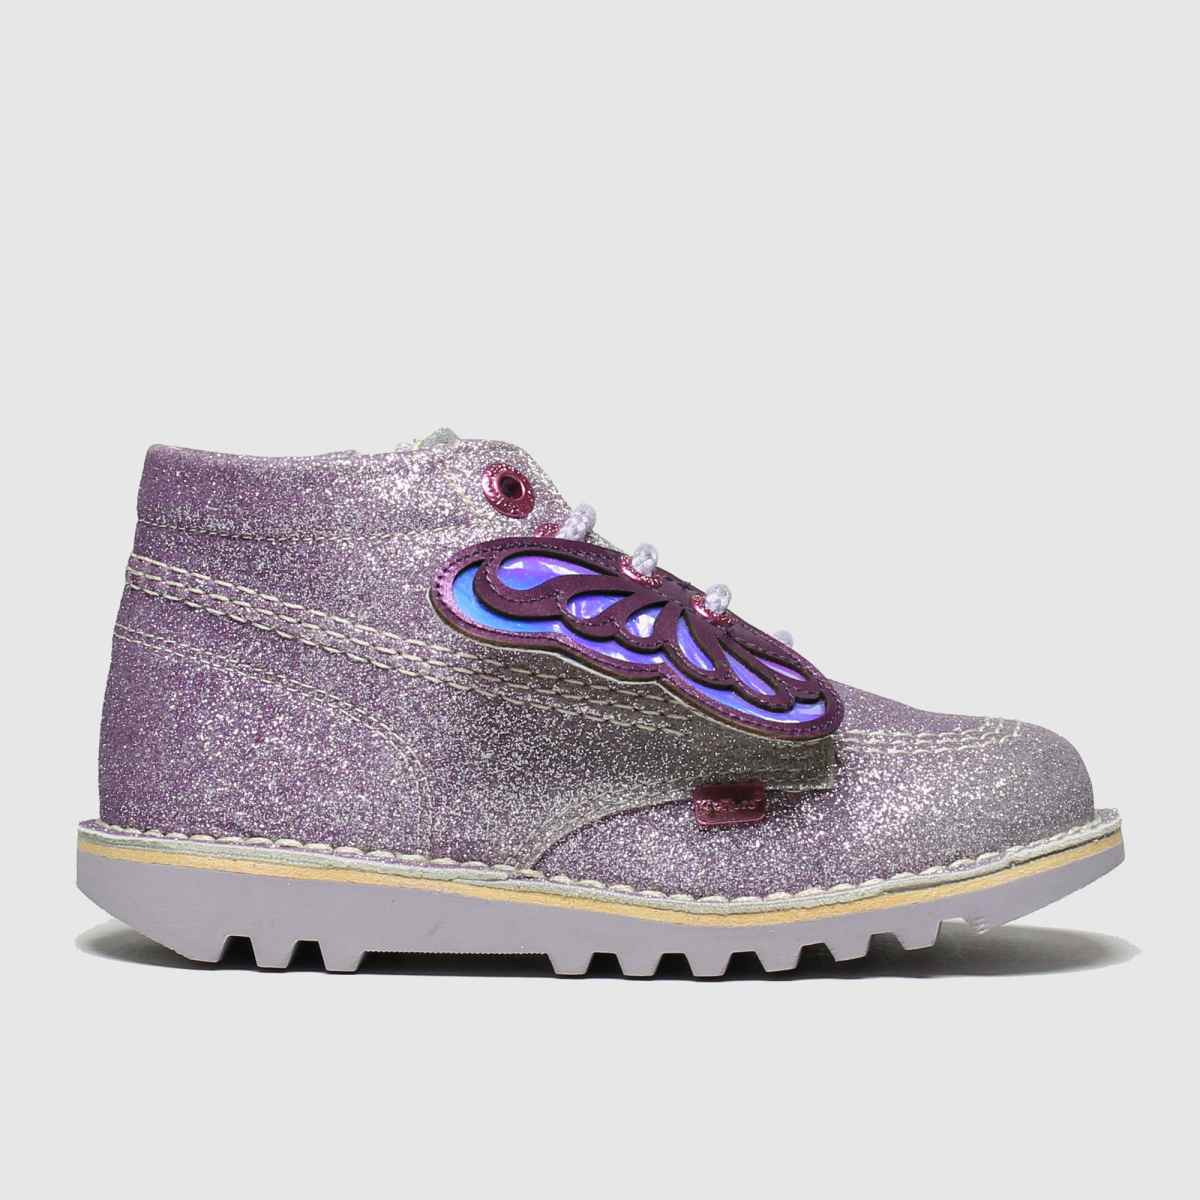 Kickers Purple Hi Faeries Boots Toddler